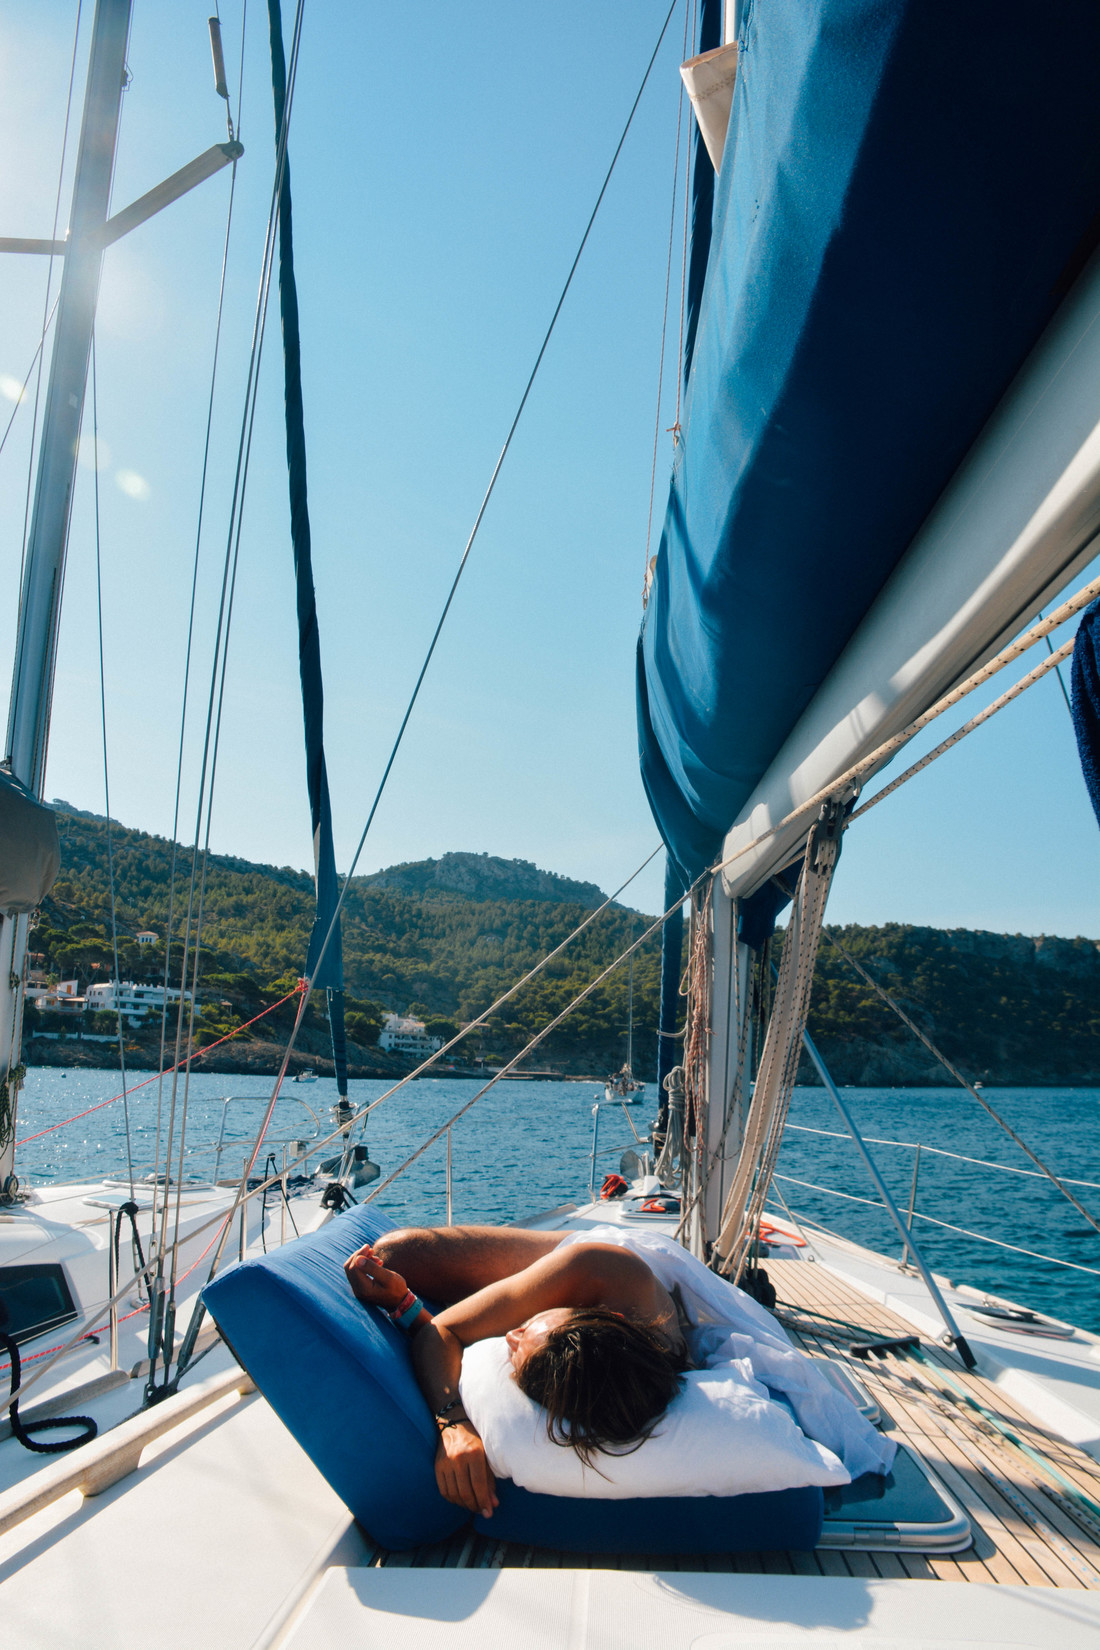 mallorca_sailing_perrirothenberg-6740.jpg